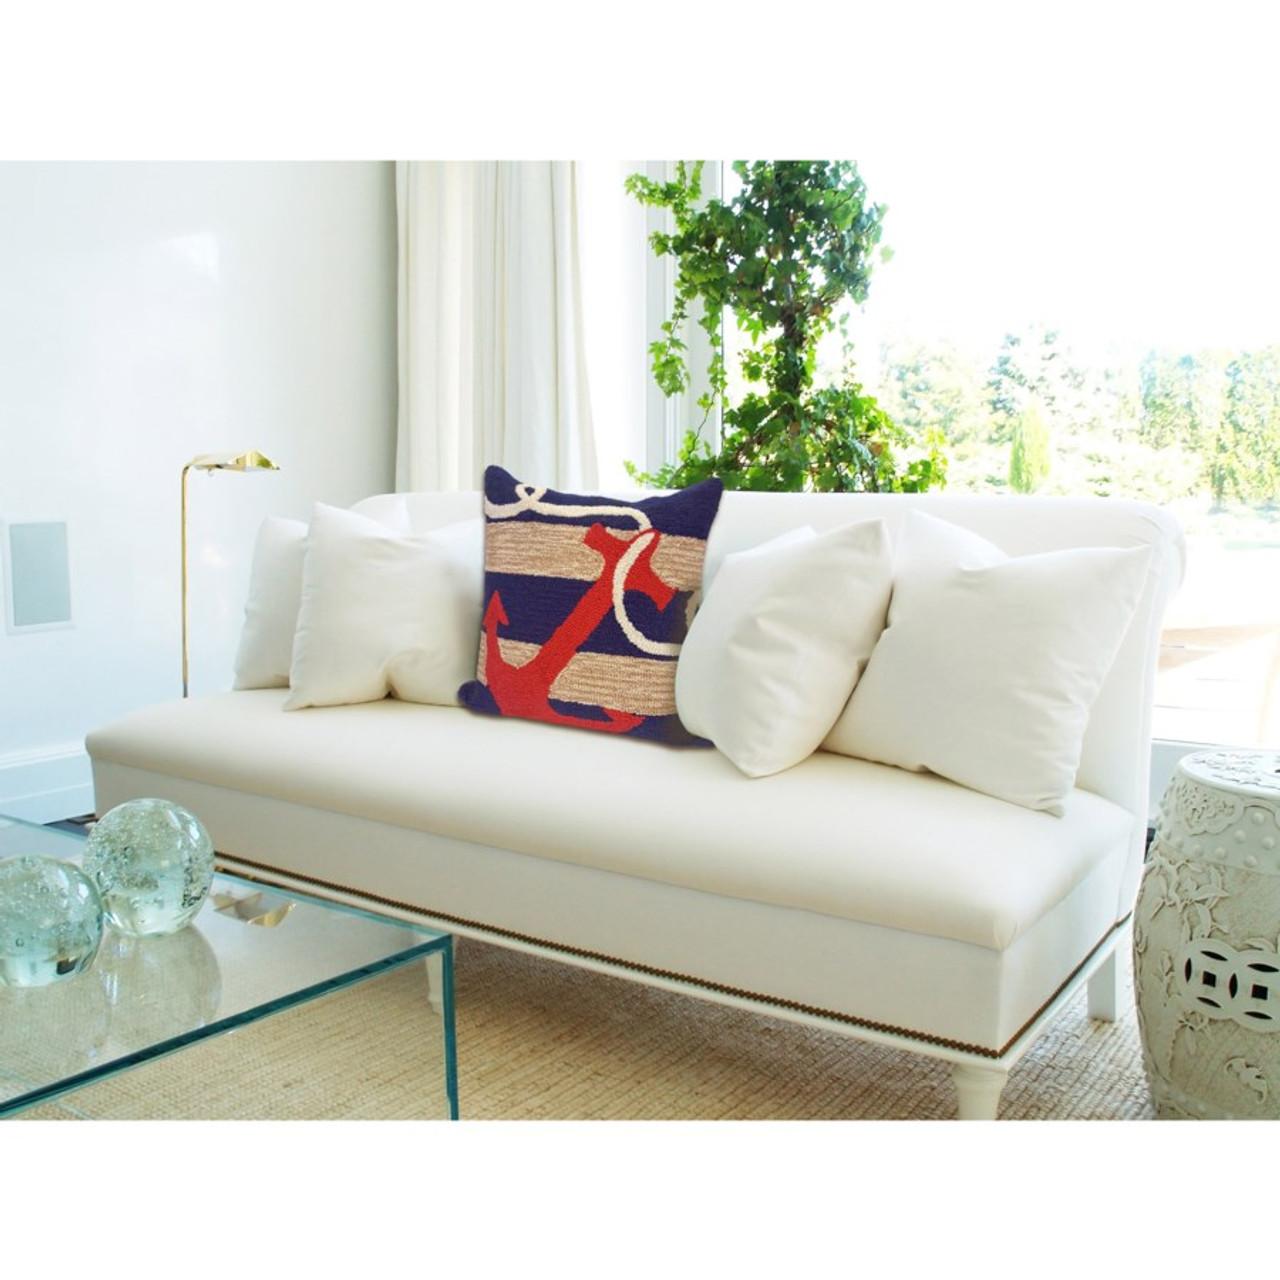 Frontporch Navy Anchor Indoor/Outdoor Throw Pillow - Lifestyle 3